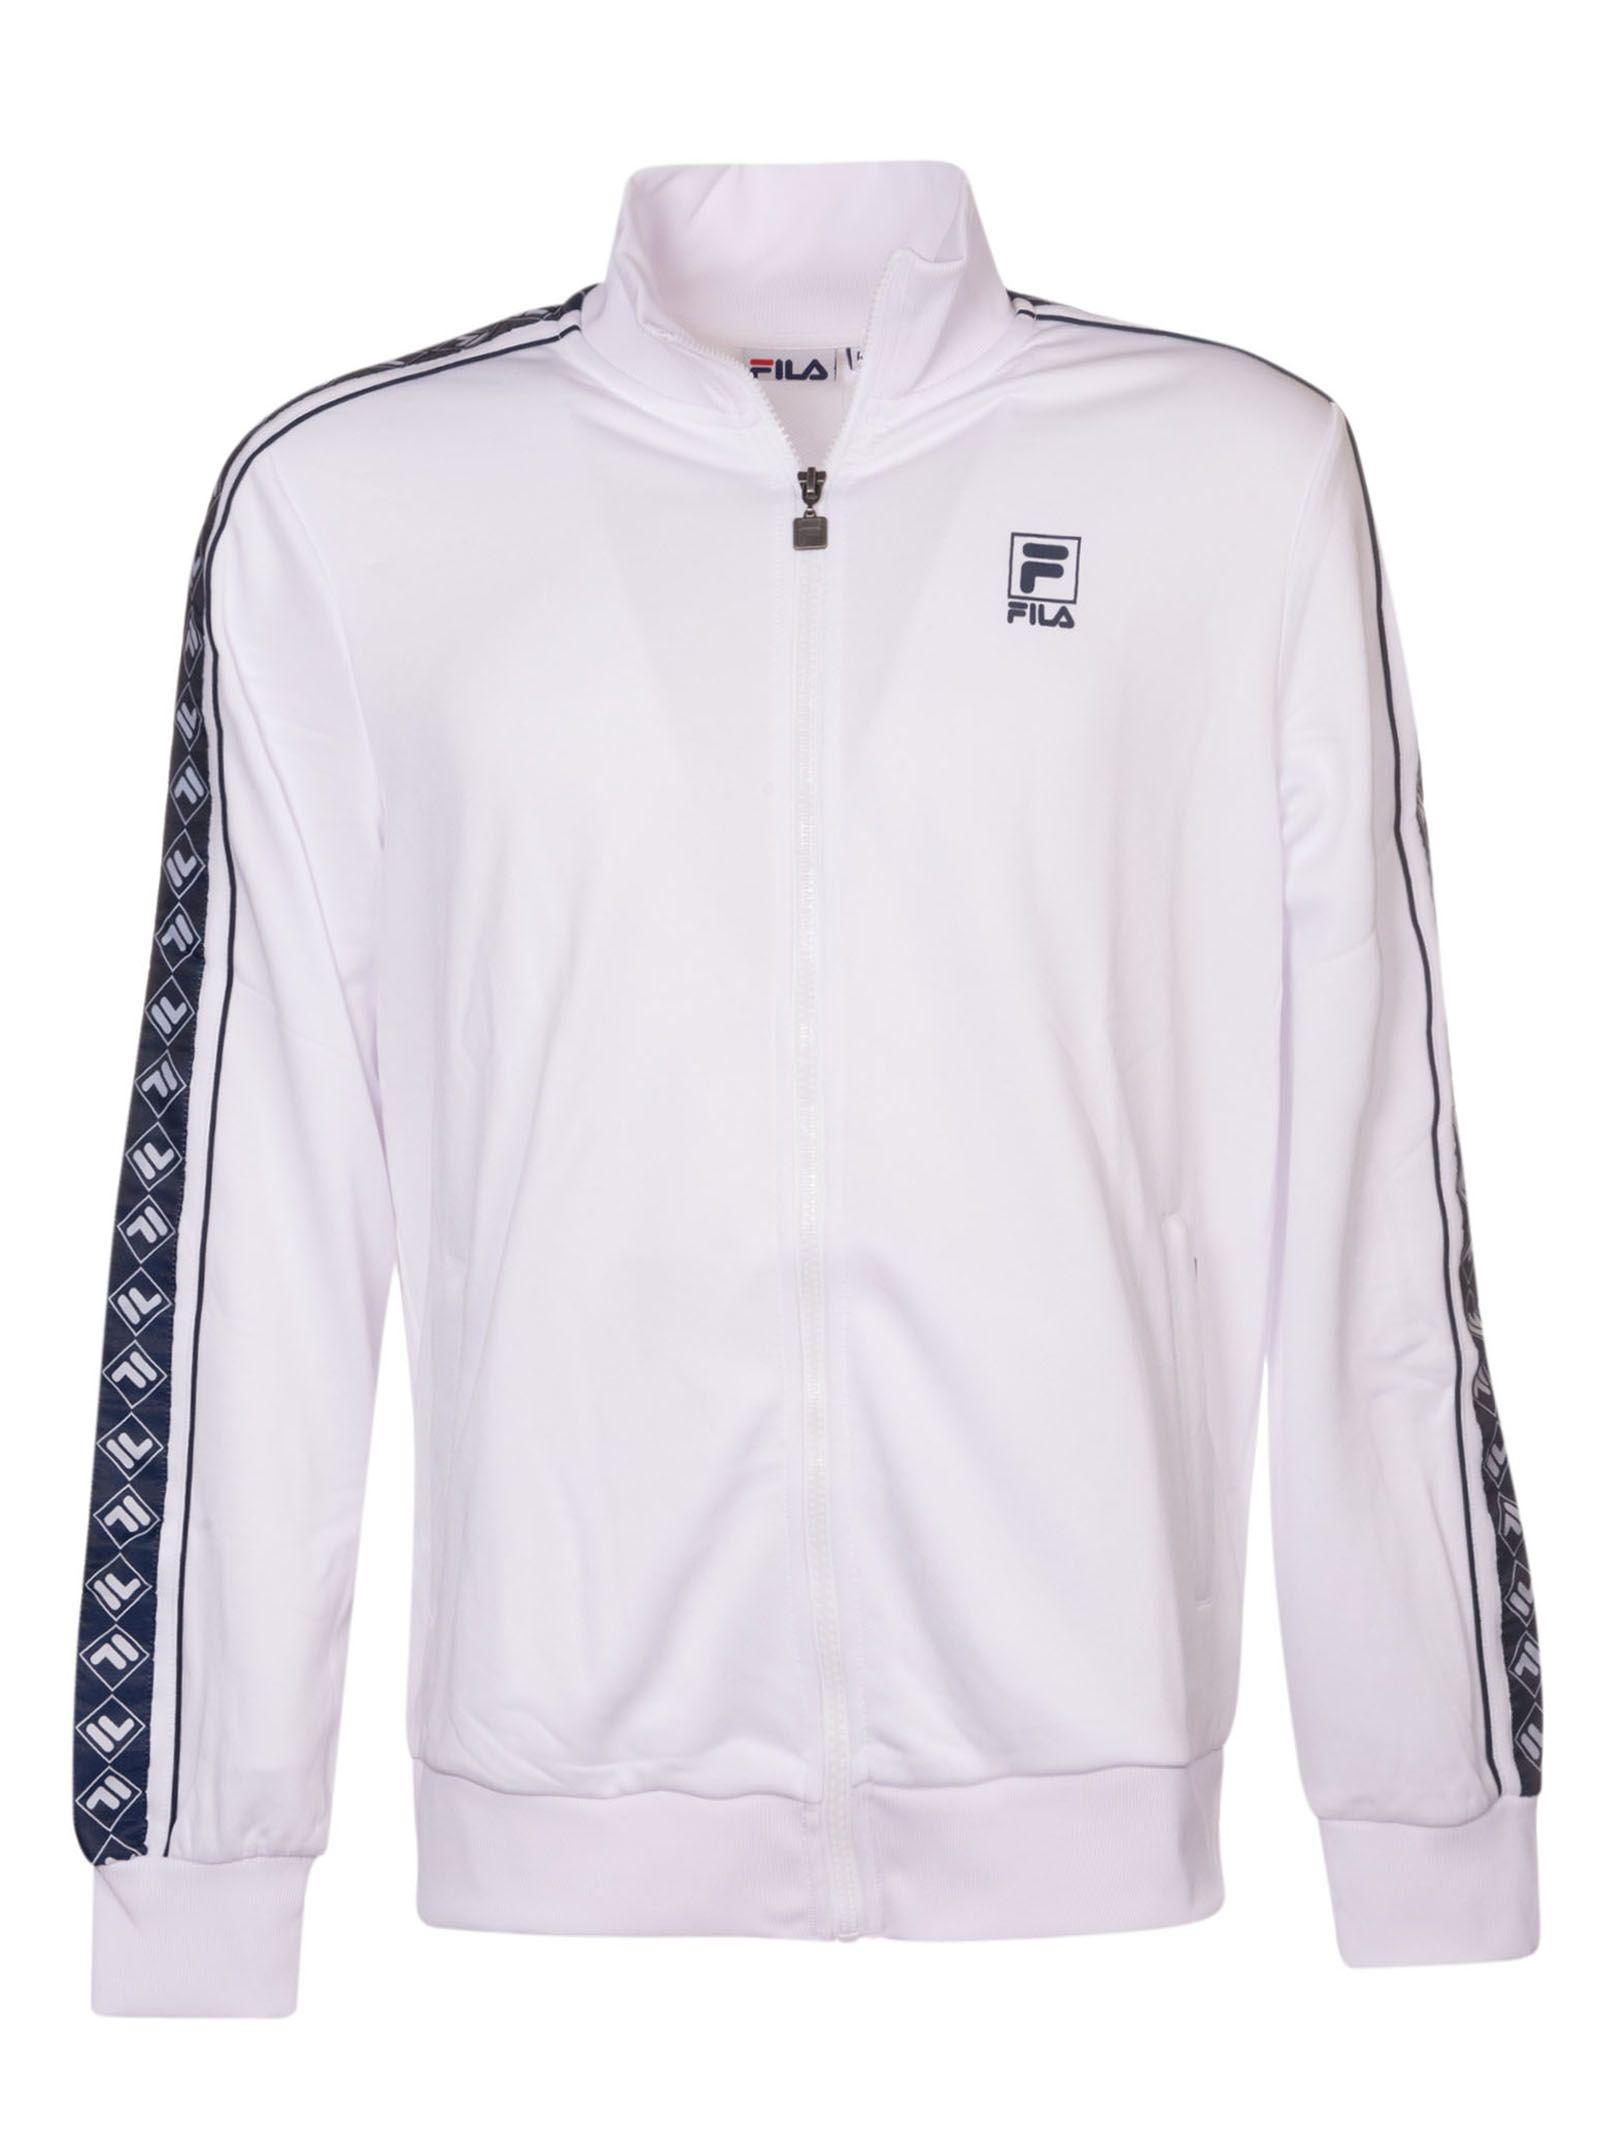 6dfaf933142e Fila Fila Ralph Track Jacket - Bright White - 10698767 | italist